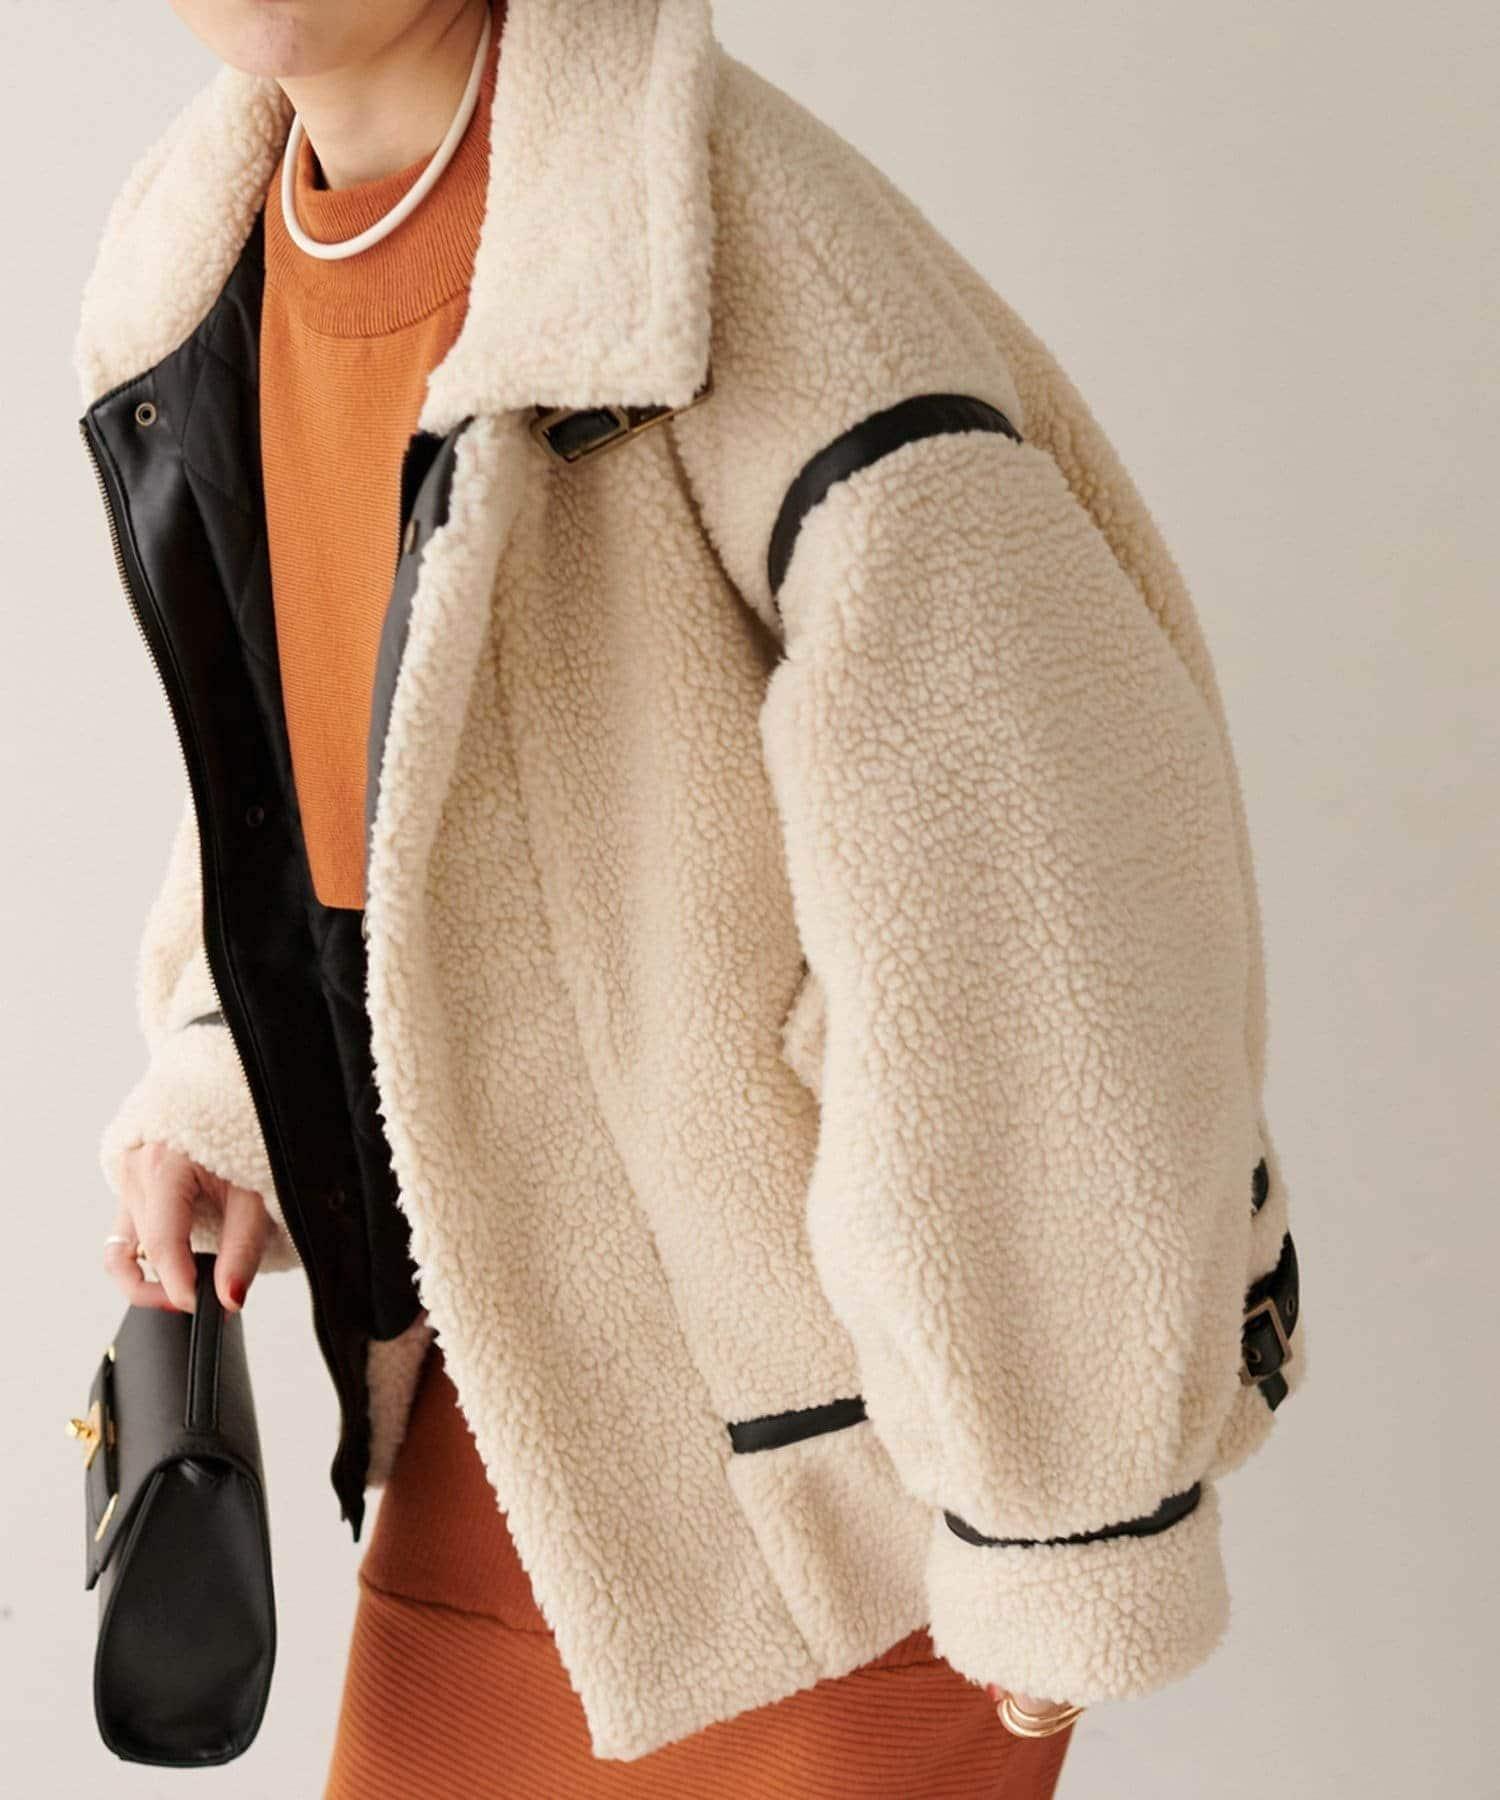 Discoat(ディスコート) ボアパイピングB3ジャケット